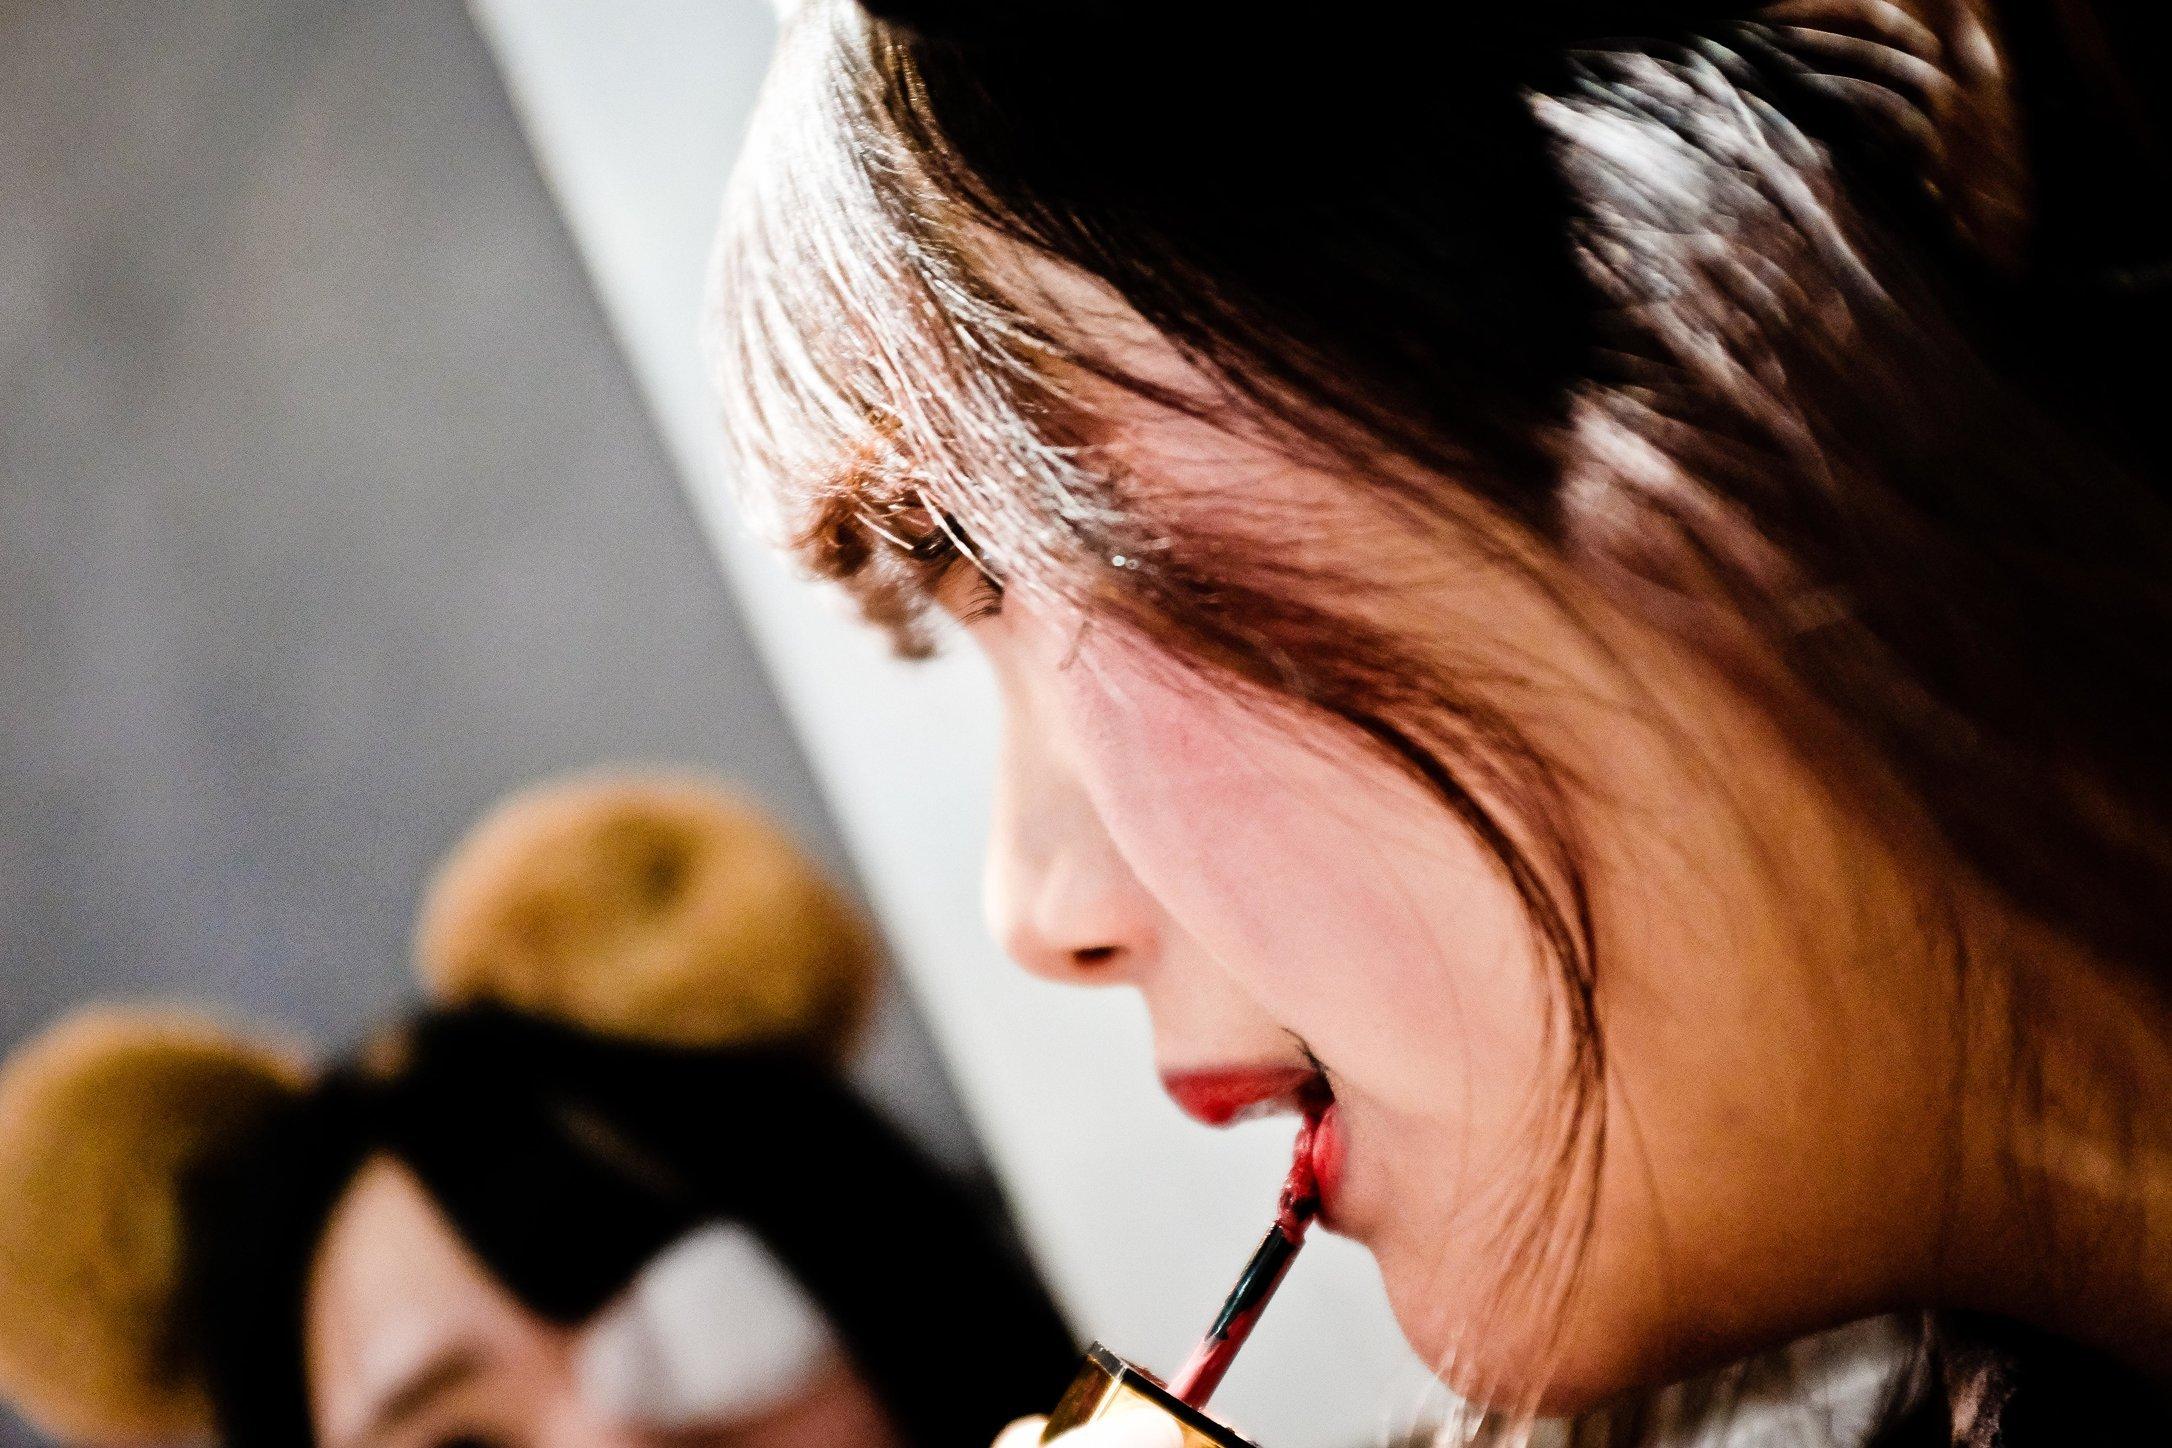 ShibuyaTimeWebsite-8.jpg